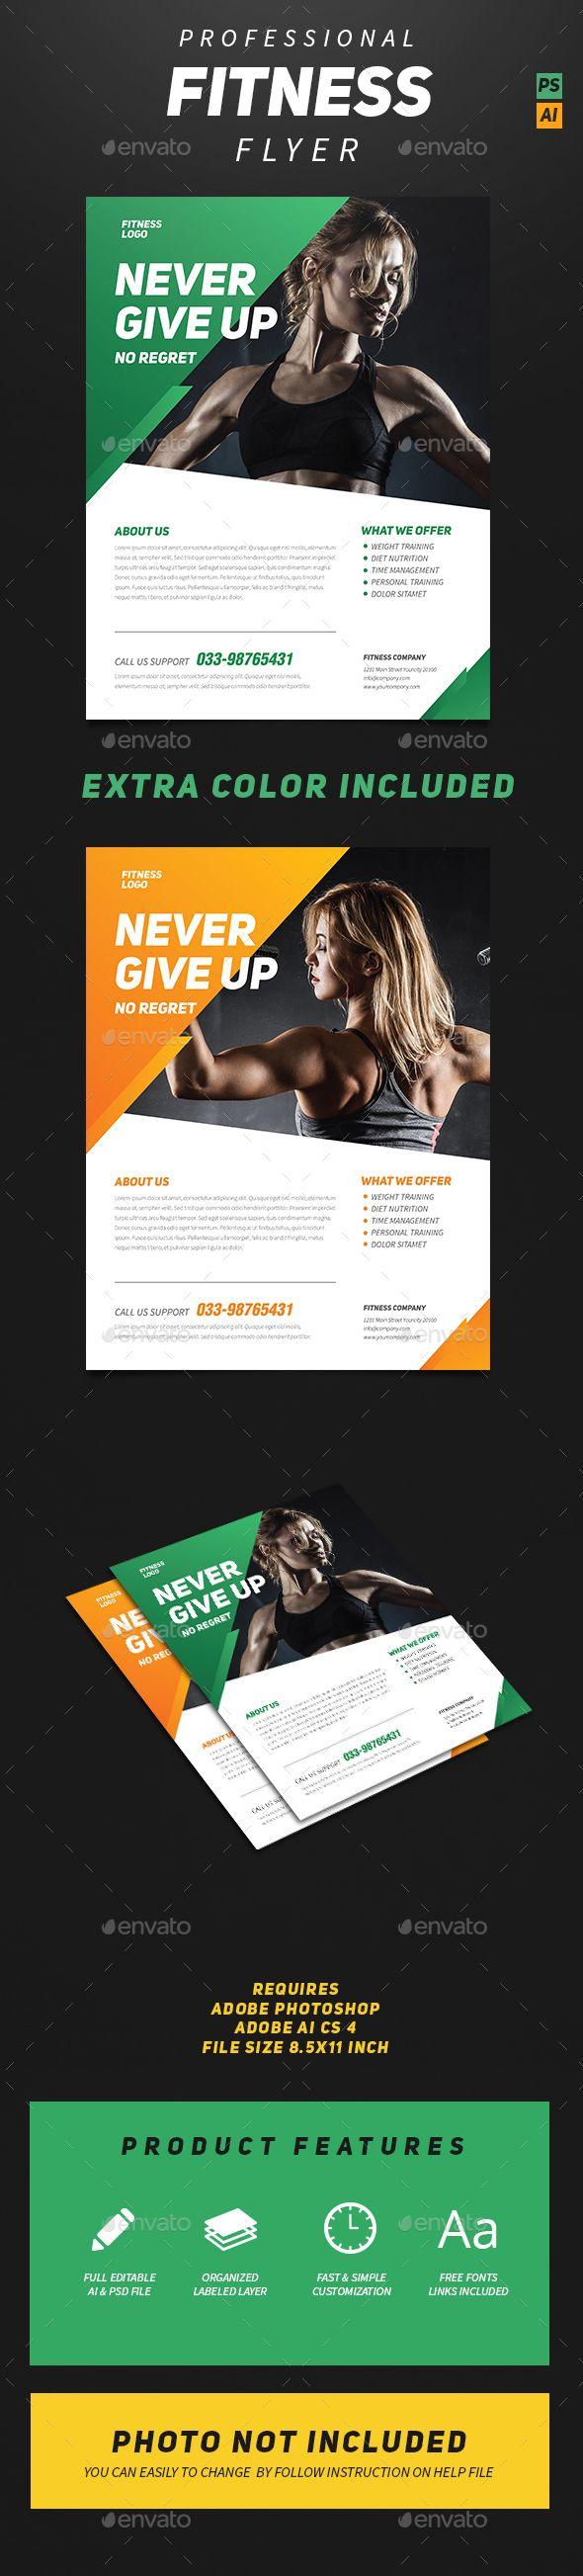 Professional Fitness Flyer Template PSD #design Download: http://graphicriver.net/item/professional-fitness-flyer/14059698?ref=ksioks